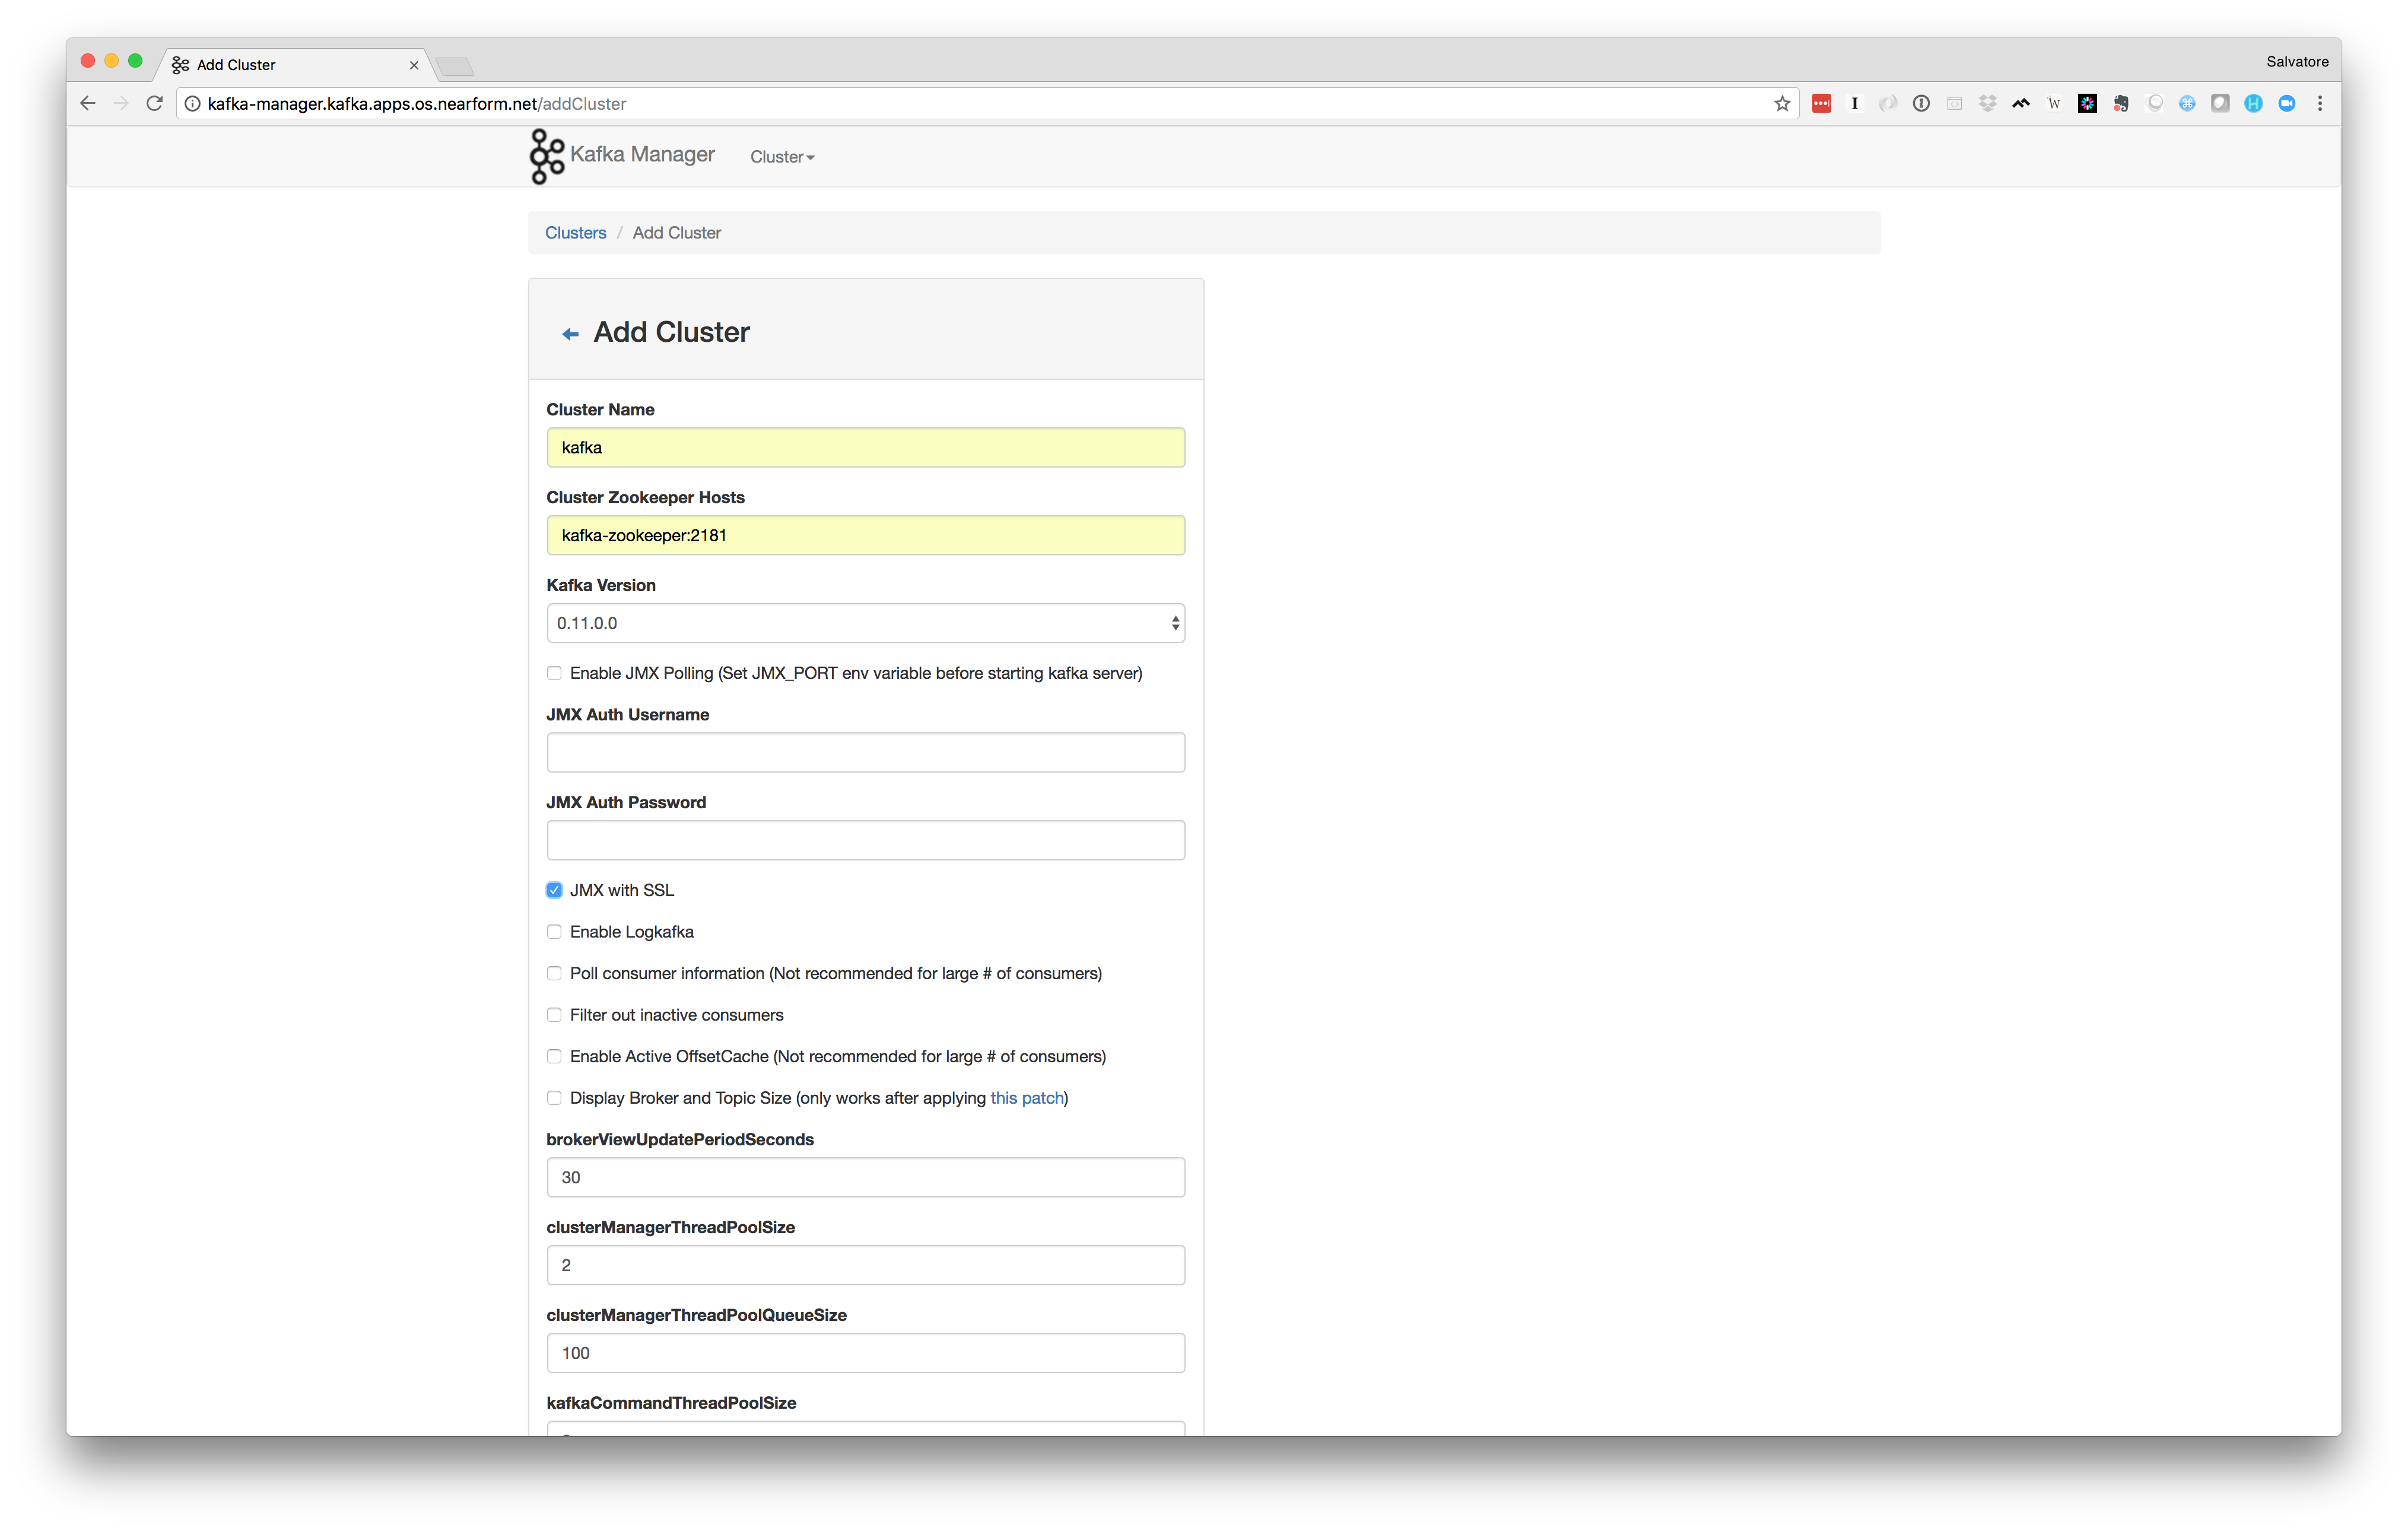 Benchmarking Apache Kafka deployed on OpenShift with Helm